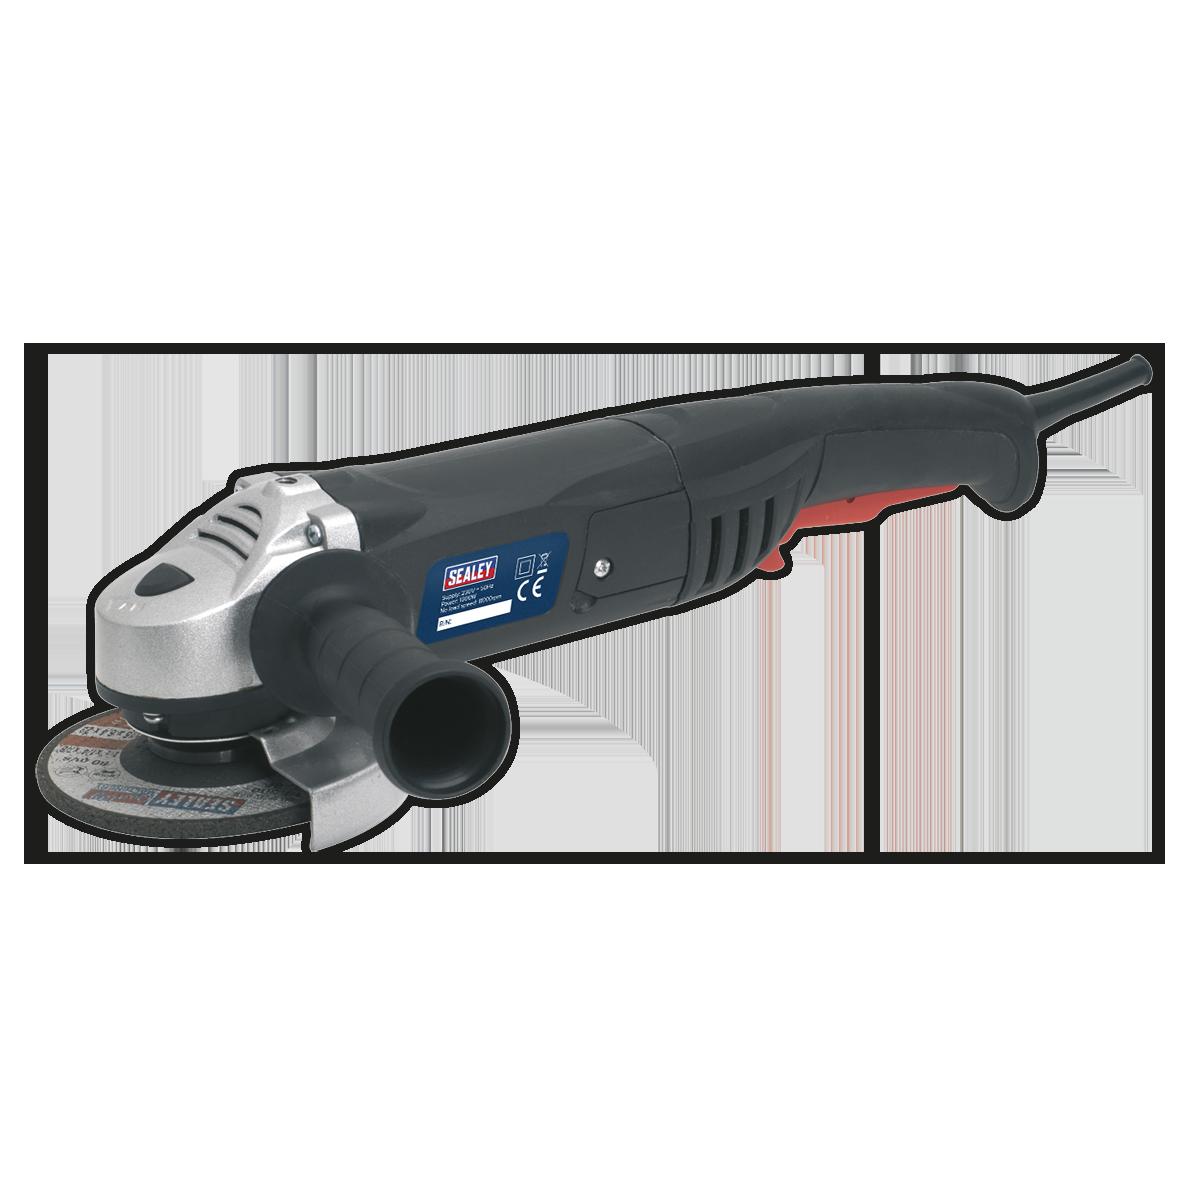 Angle Grinder Ø125mm 1000W/230V with Schuko Plug